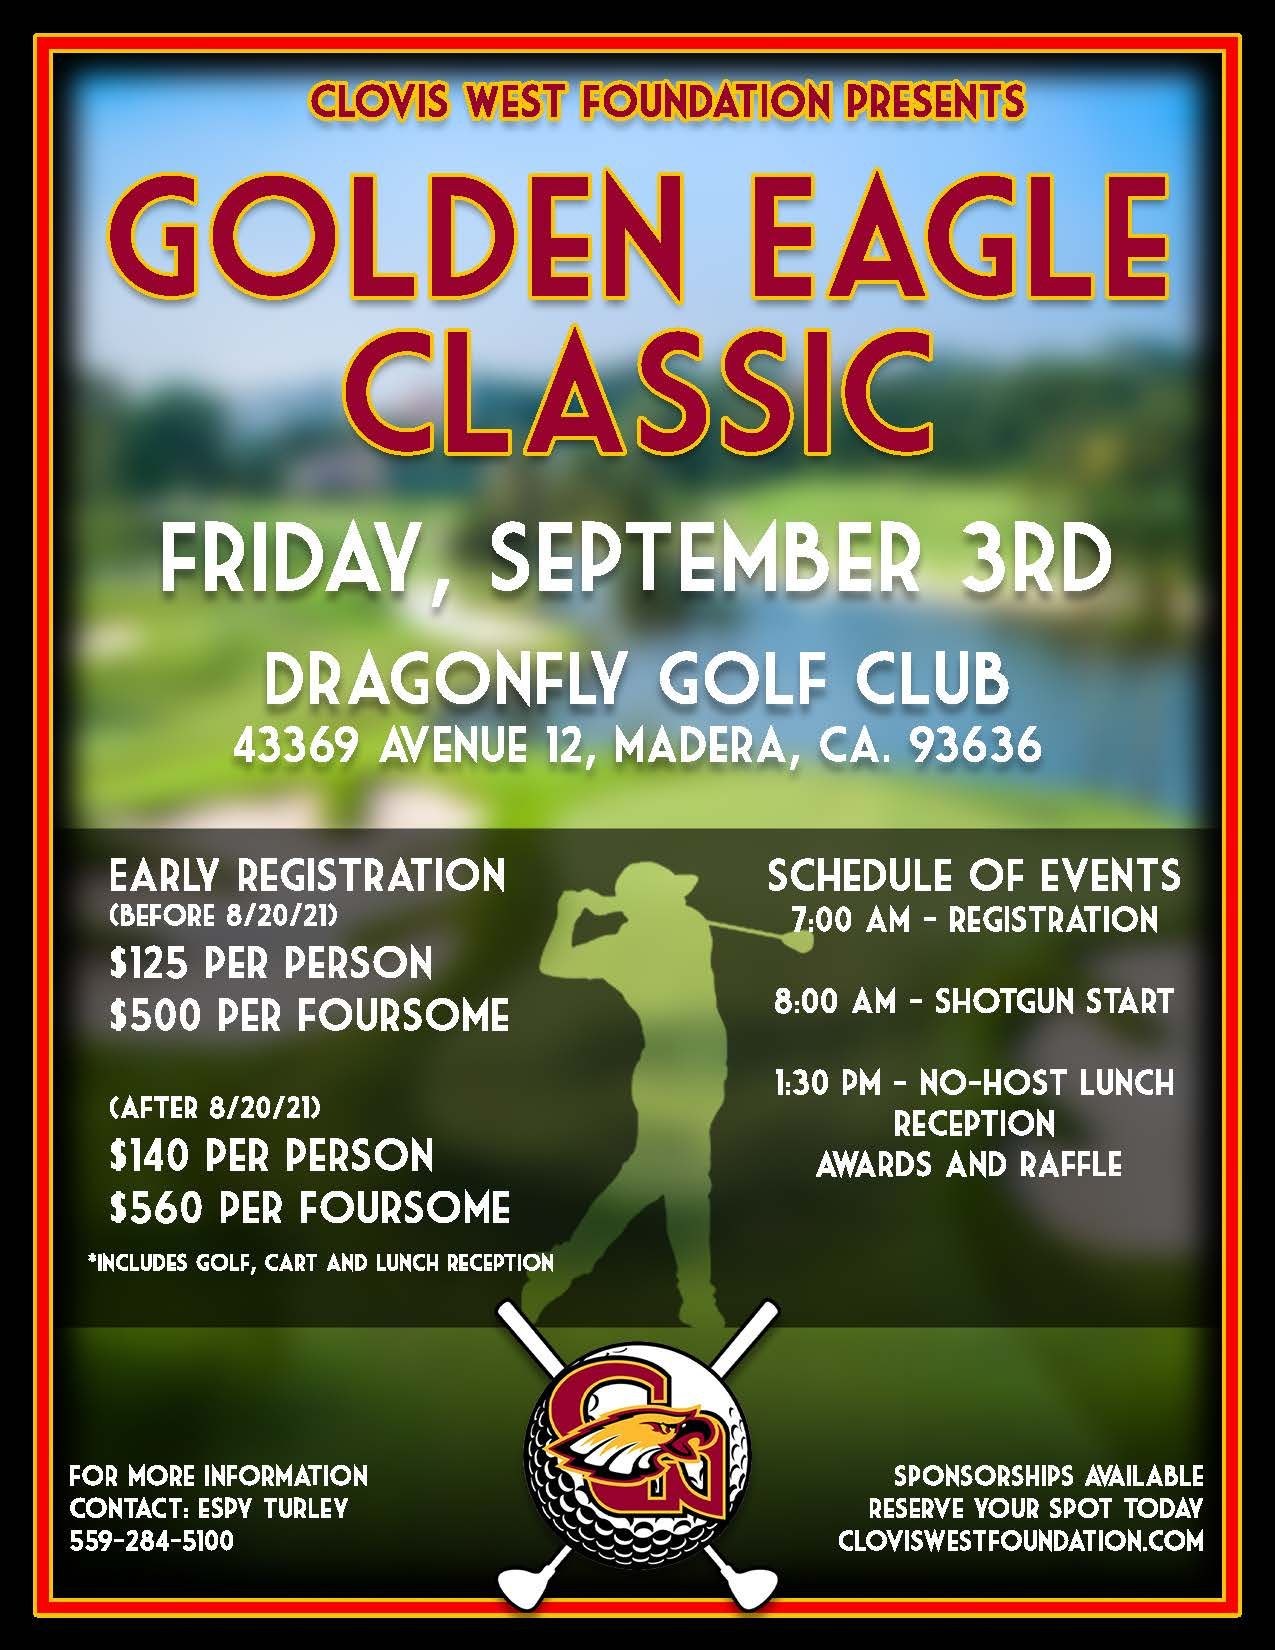 Golden Eagle Classic